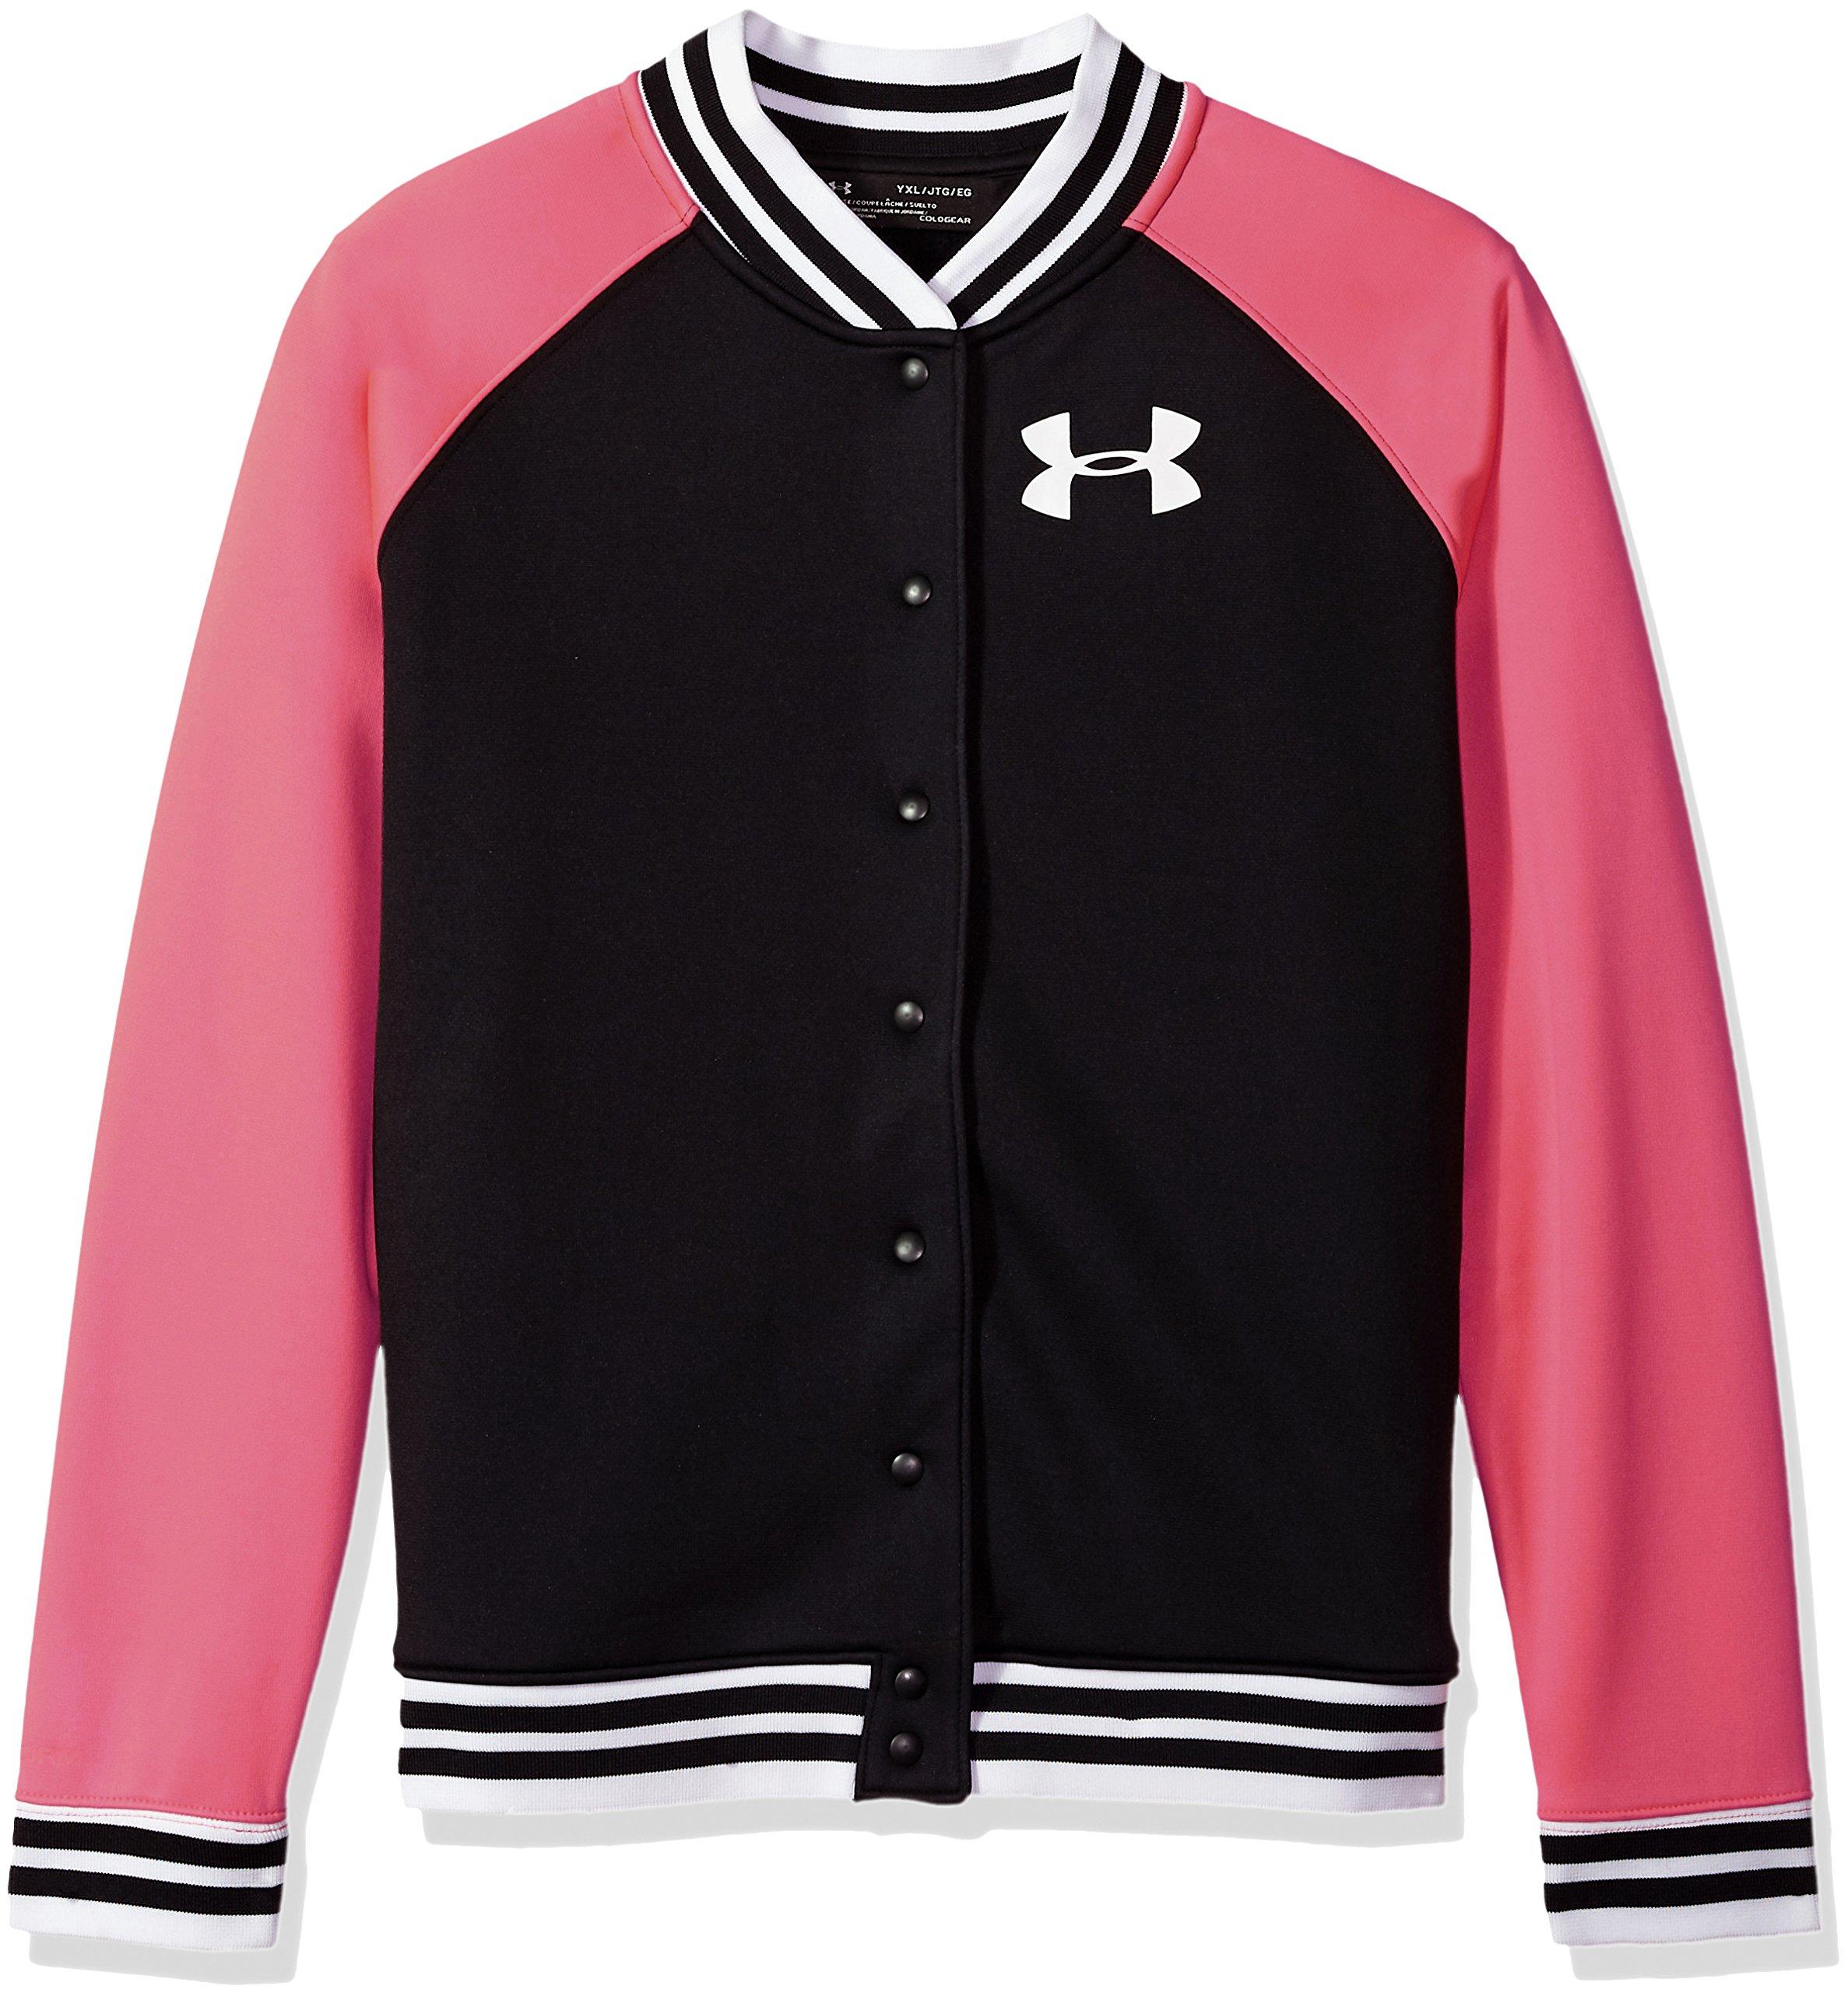 Under Armour Girls Fleece Graphic Bomber sweatshirts,Black /White, Youth X-Small